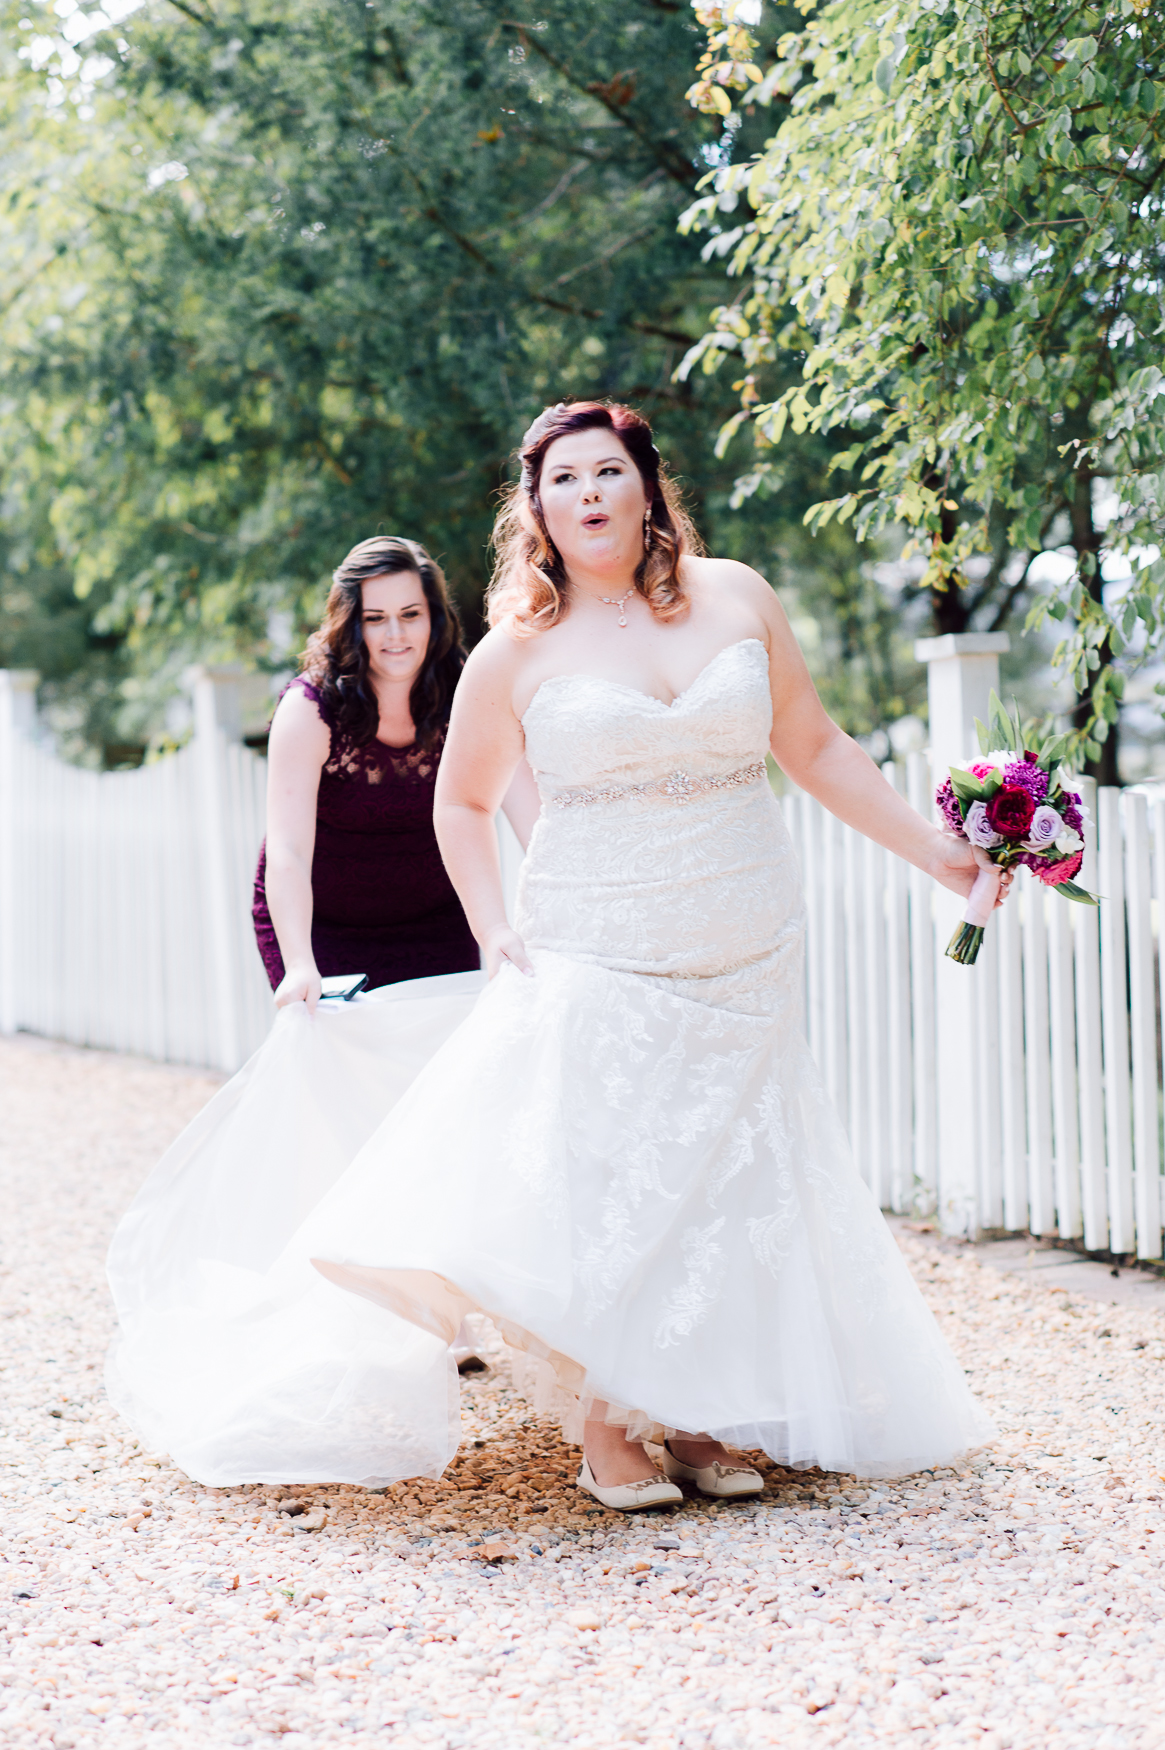 virginiawedding_GlenGarden_rusticwedding_fredericksburg_youseephotography_KellySteven (61).jpg